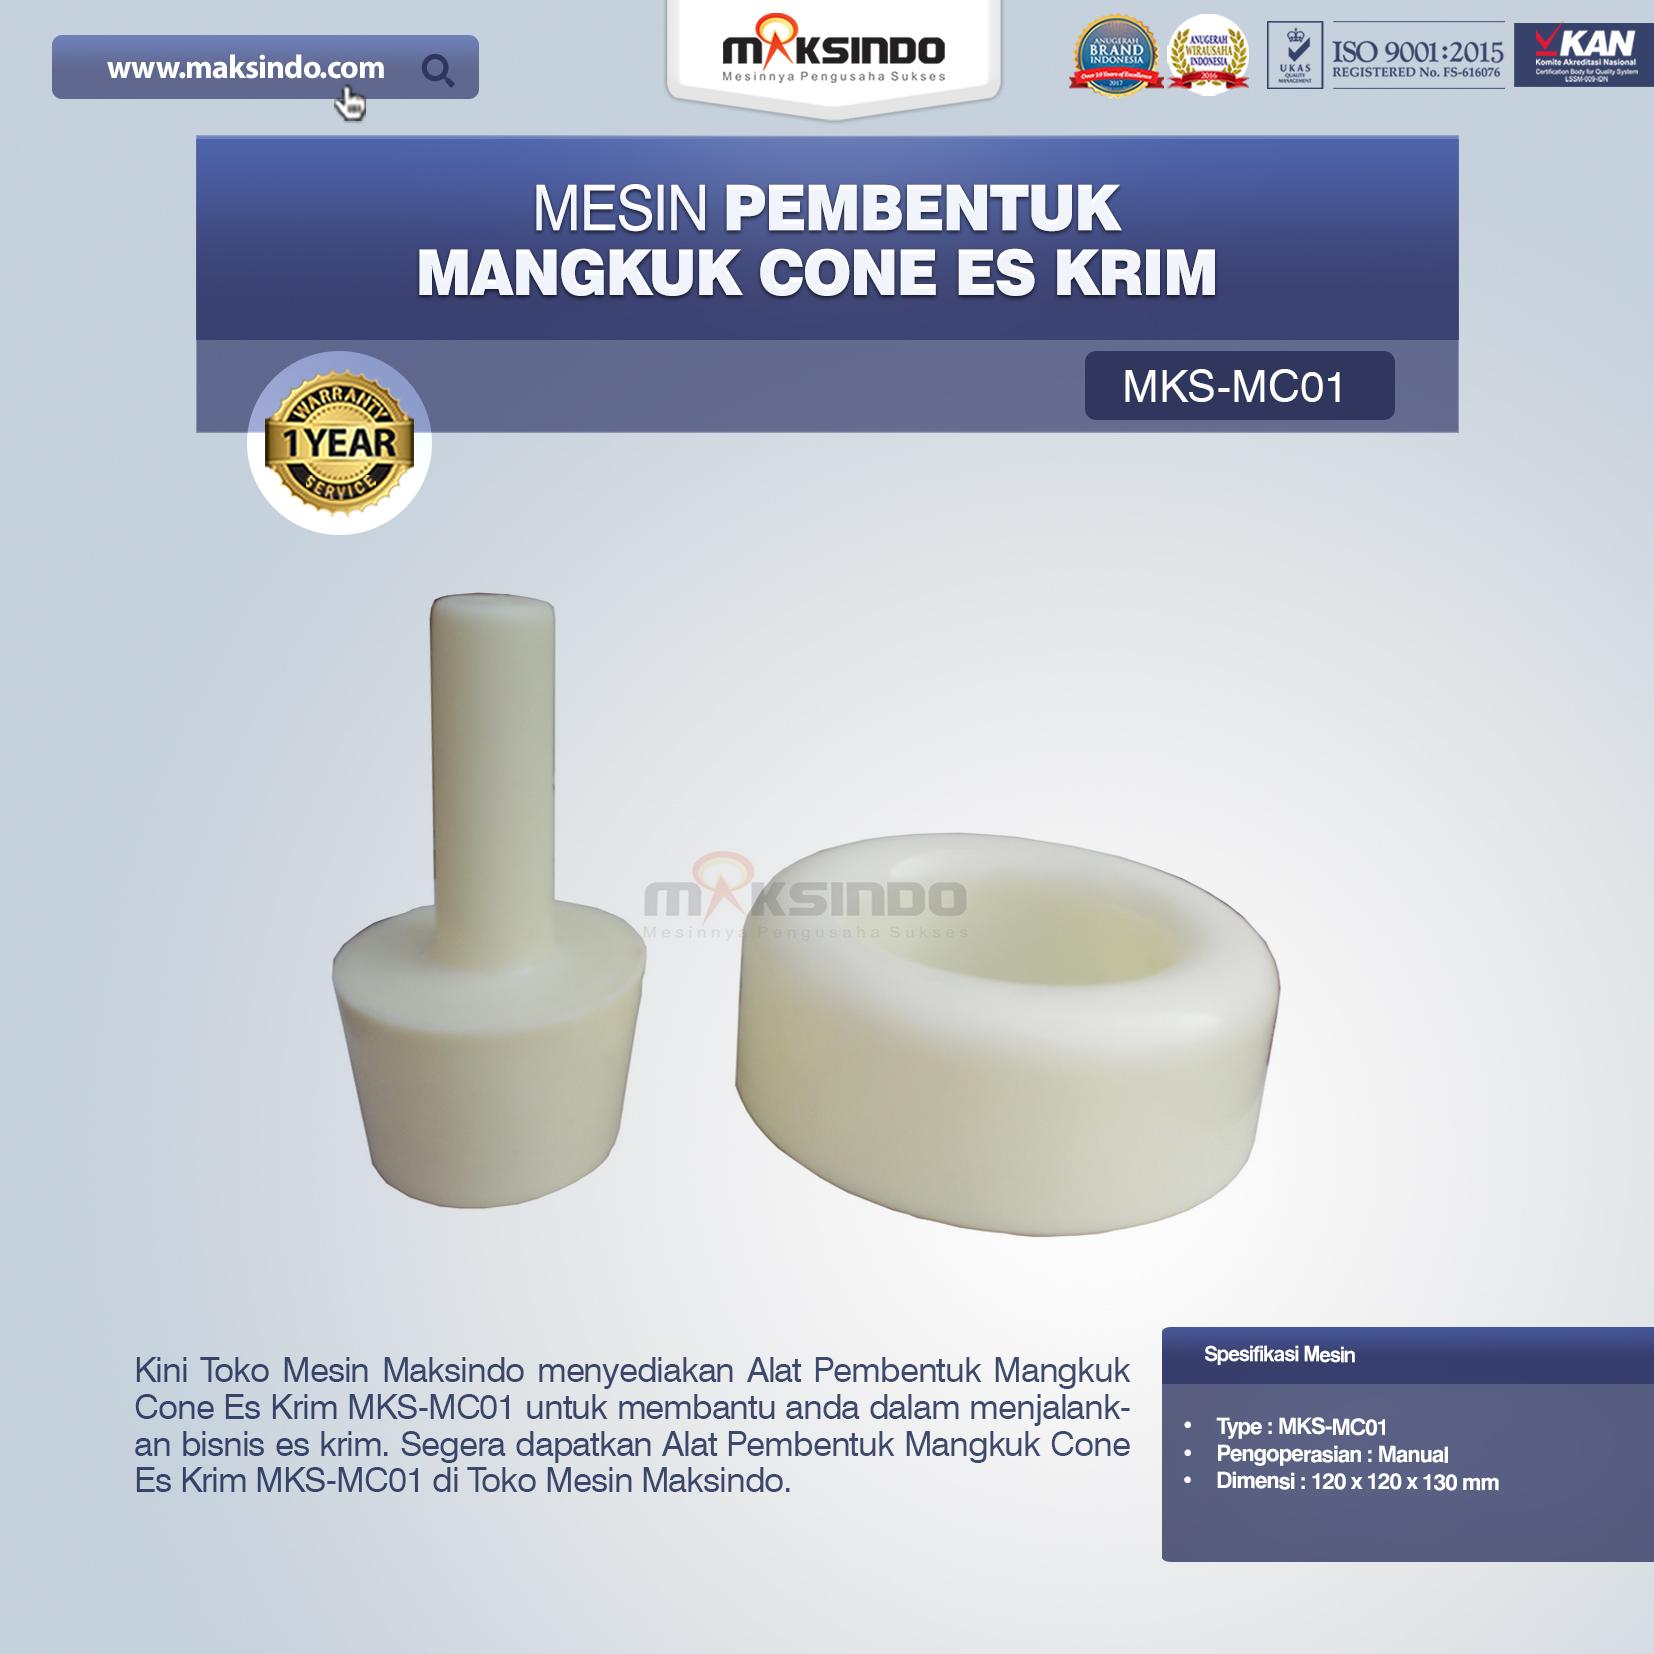 Jual Alat Pembentuk Mangkuk Cone Es Krim MKS-MC01 di Blitar